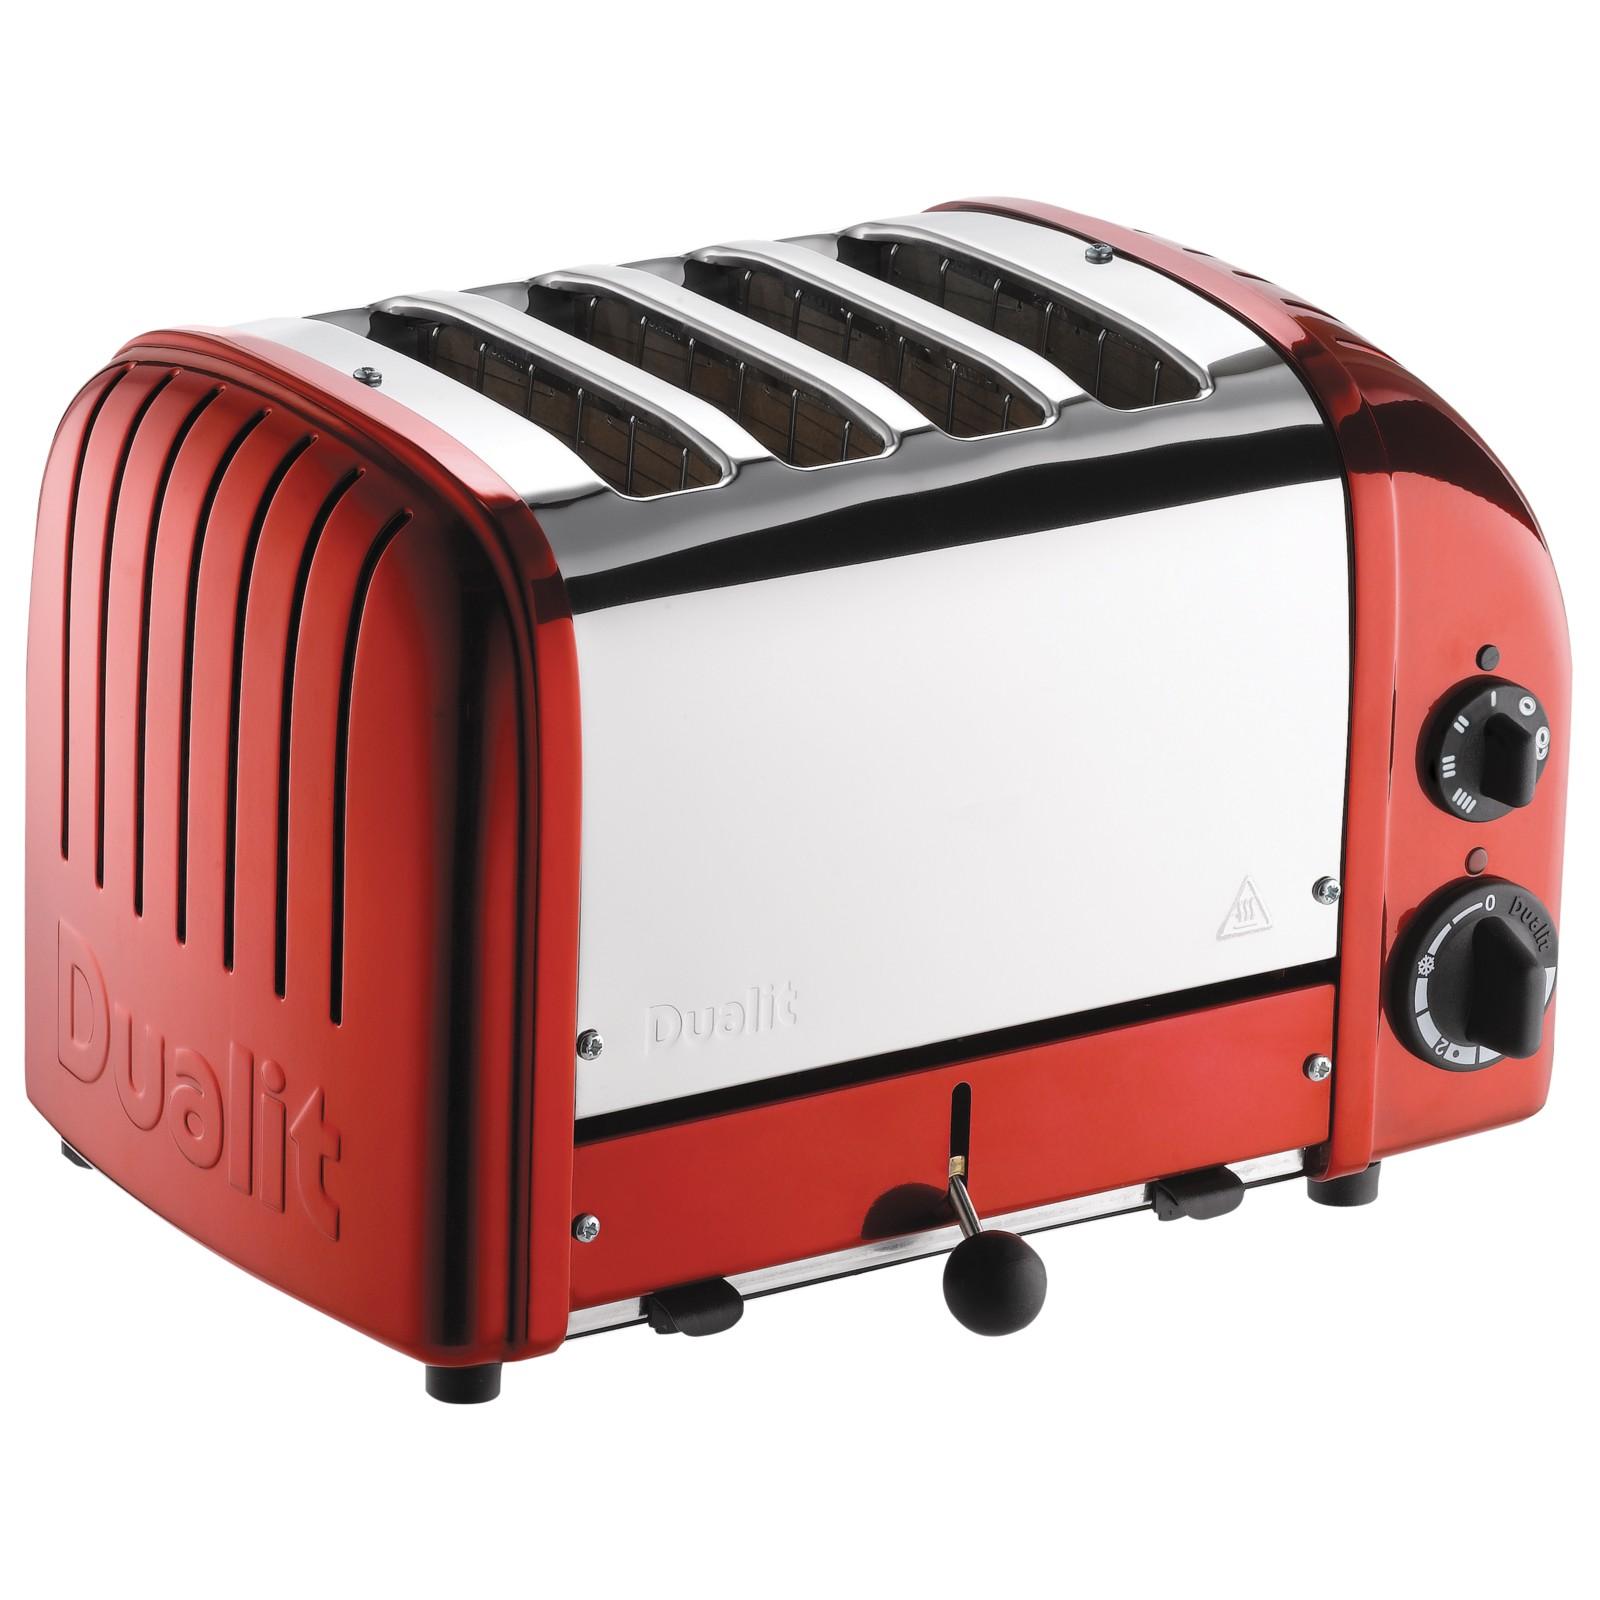 Dualit NewGen 4-Slice Toaster Apple Candy Red